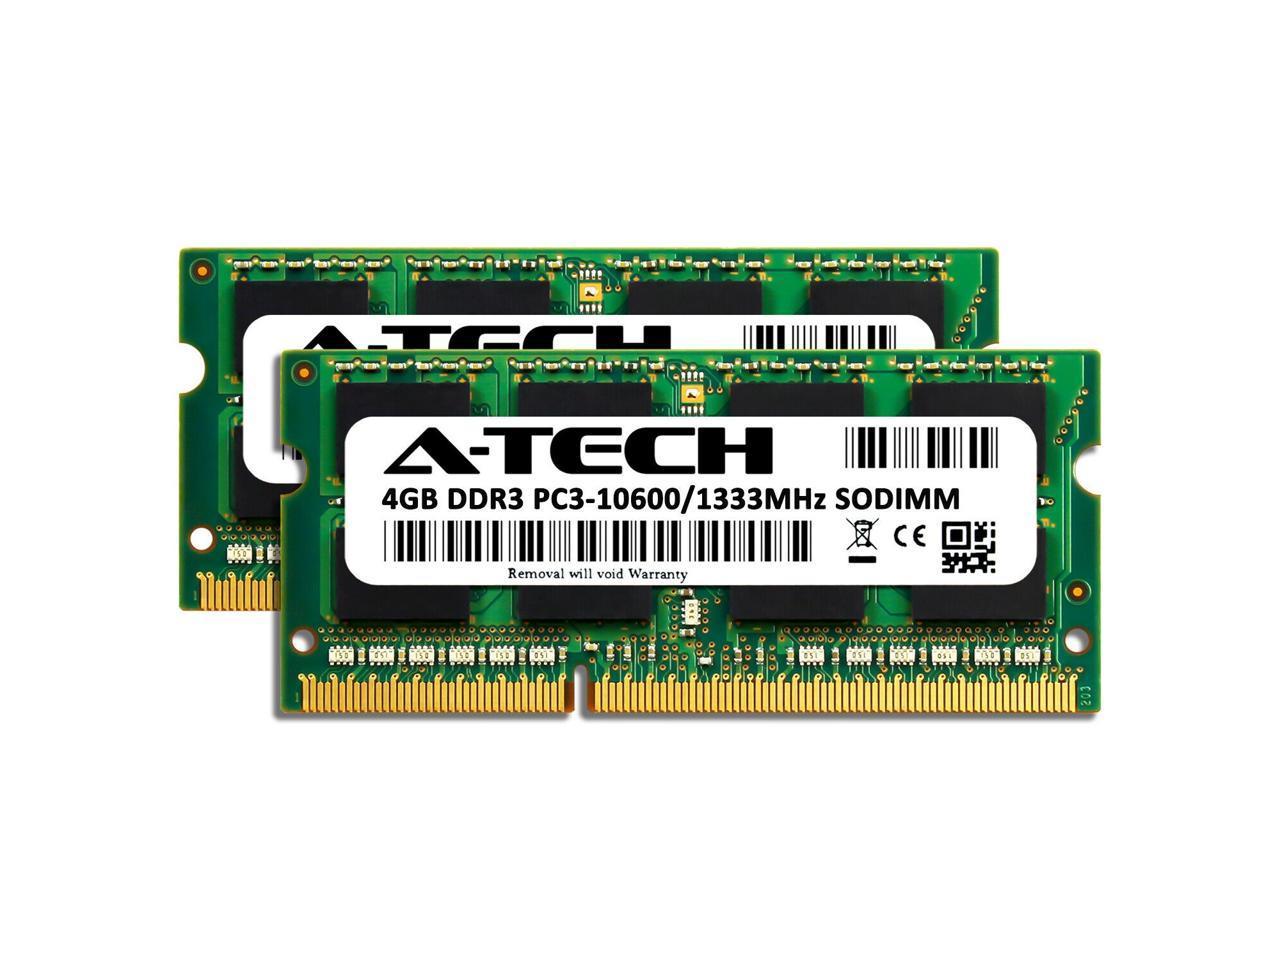 PARTS-QUICK Brand Memory Upgrade for Compaq Presario CQ5307SC PC3-10600 DDR3 1333 MHz DIMM Non-ECC Desktop RAM 2 X 2GB 4GB Kit